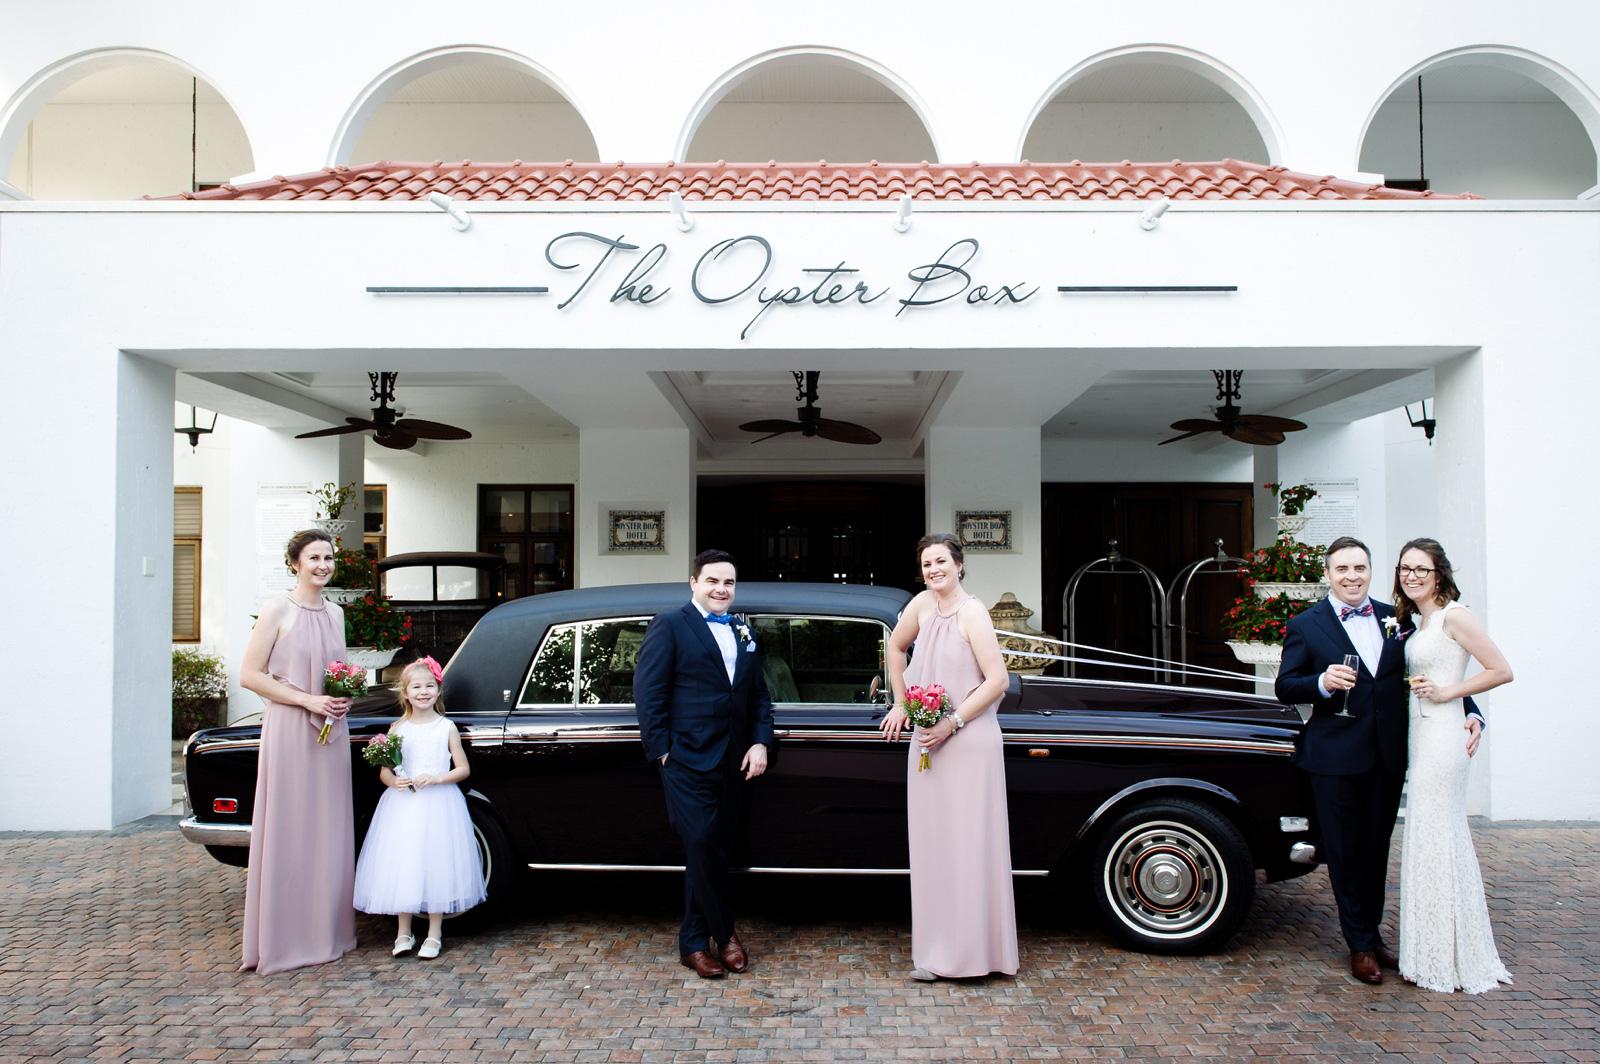 The Oyster Box wedding